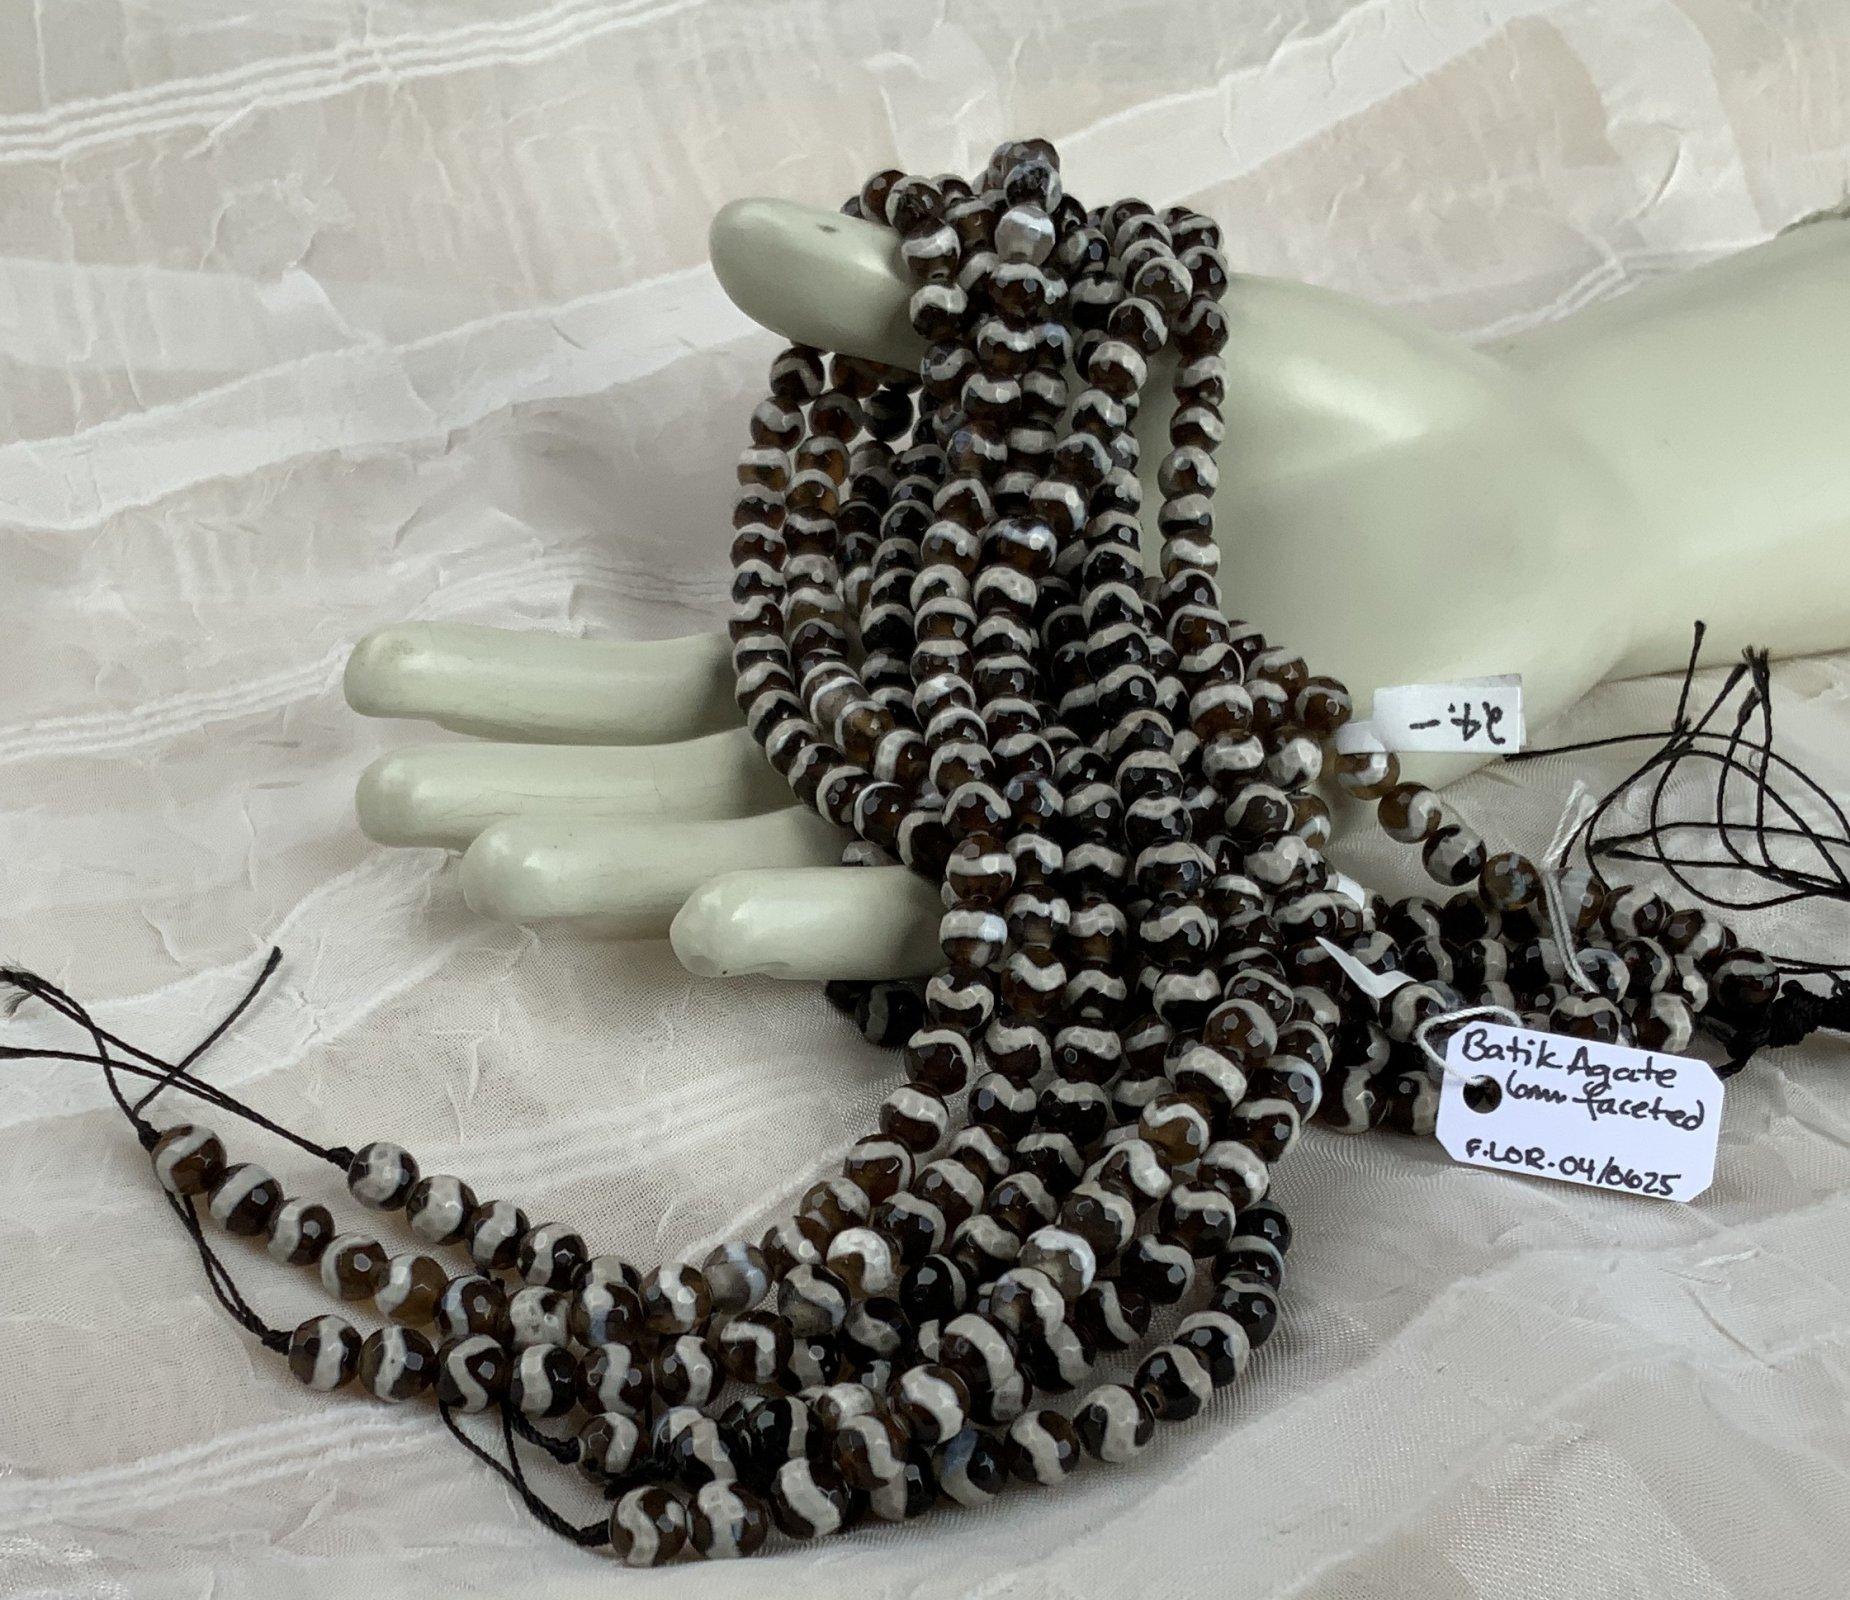 Batik Agate Brown 6mm Faceted Round